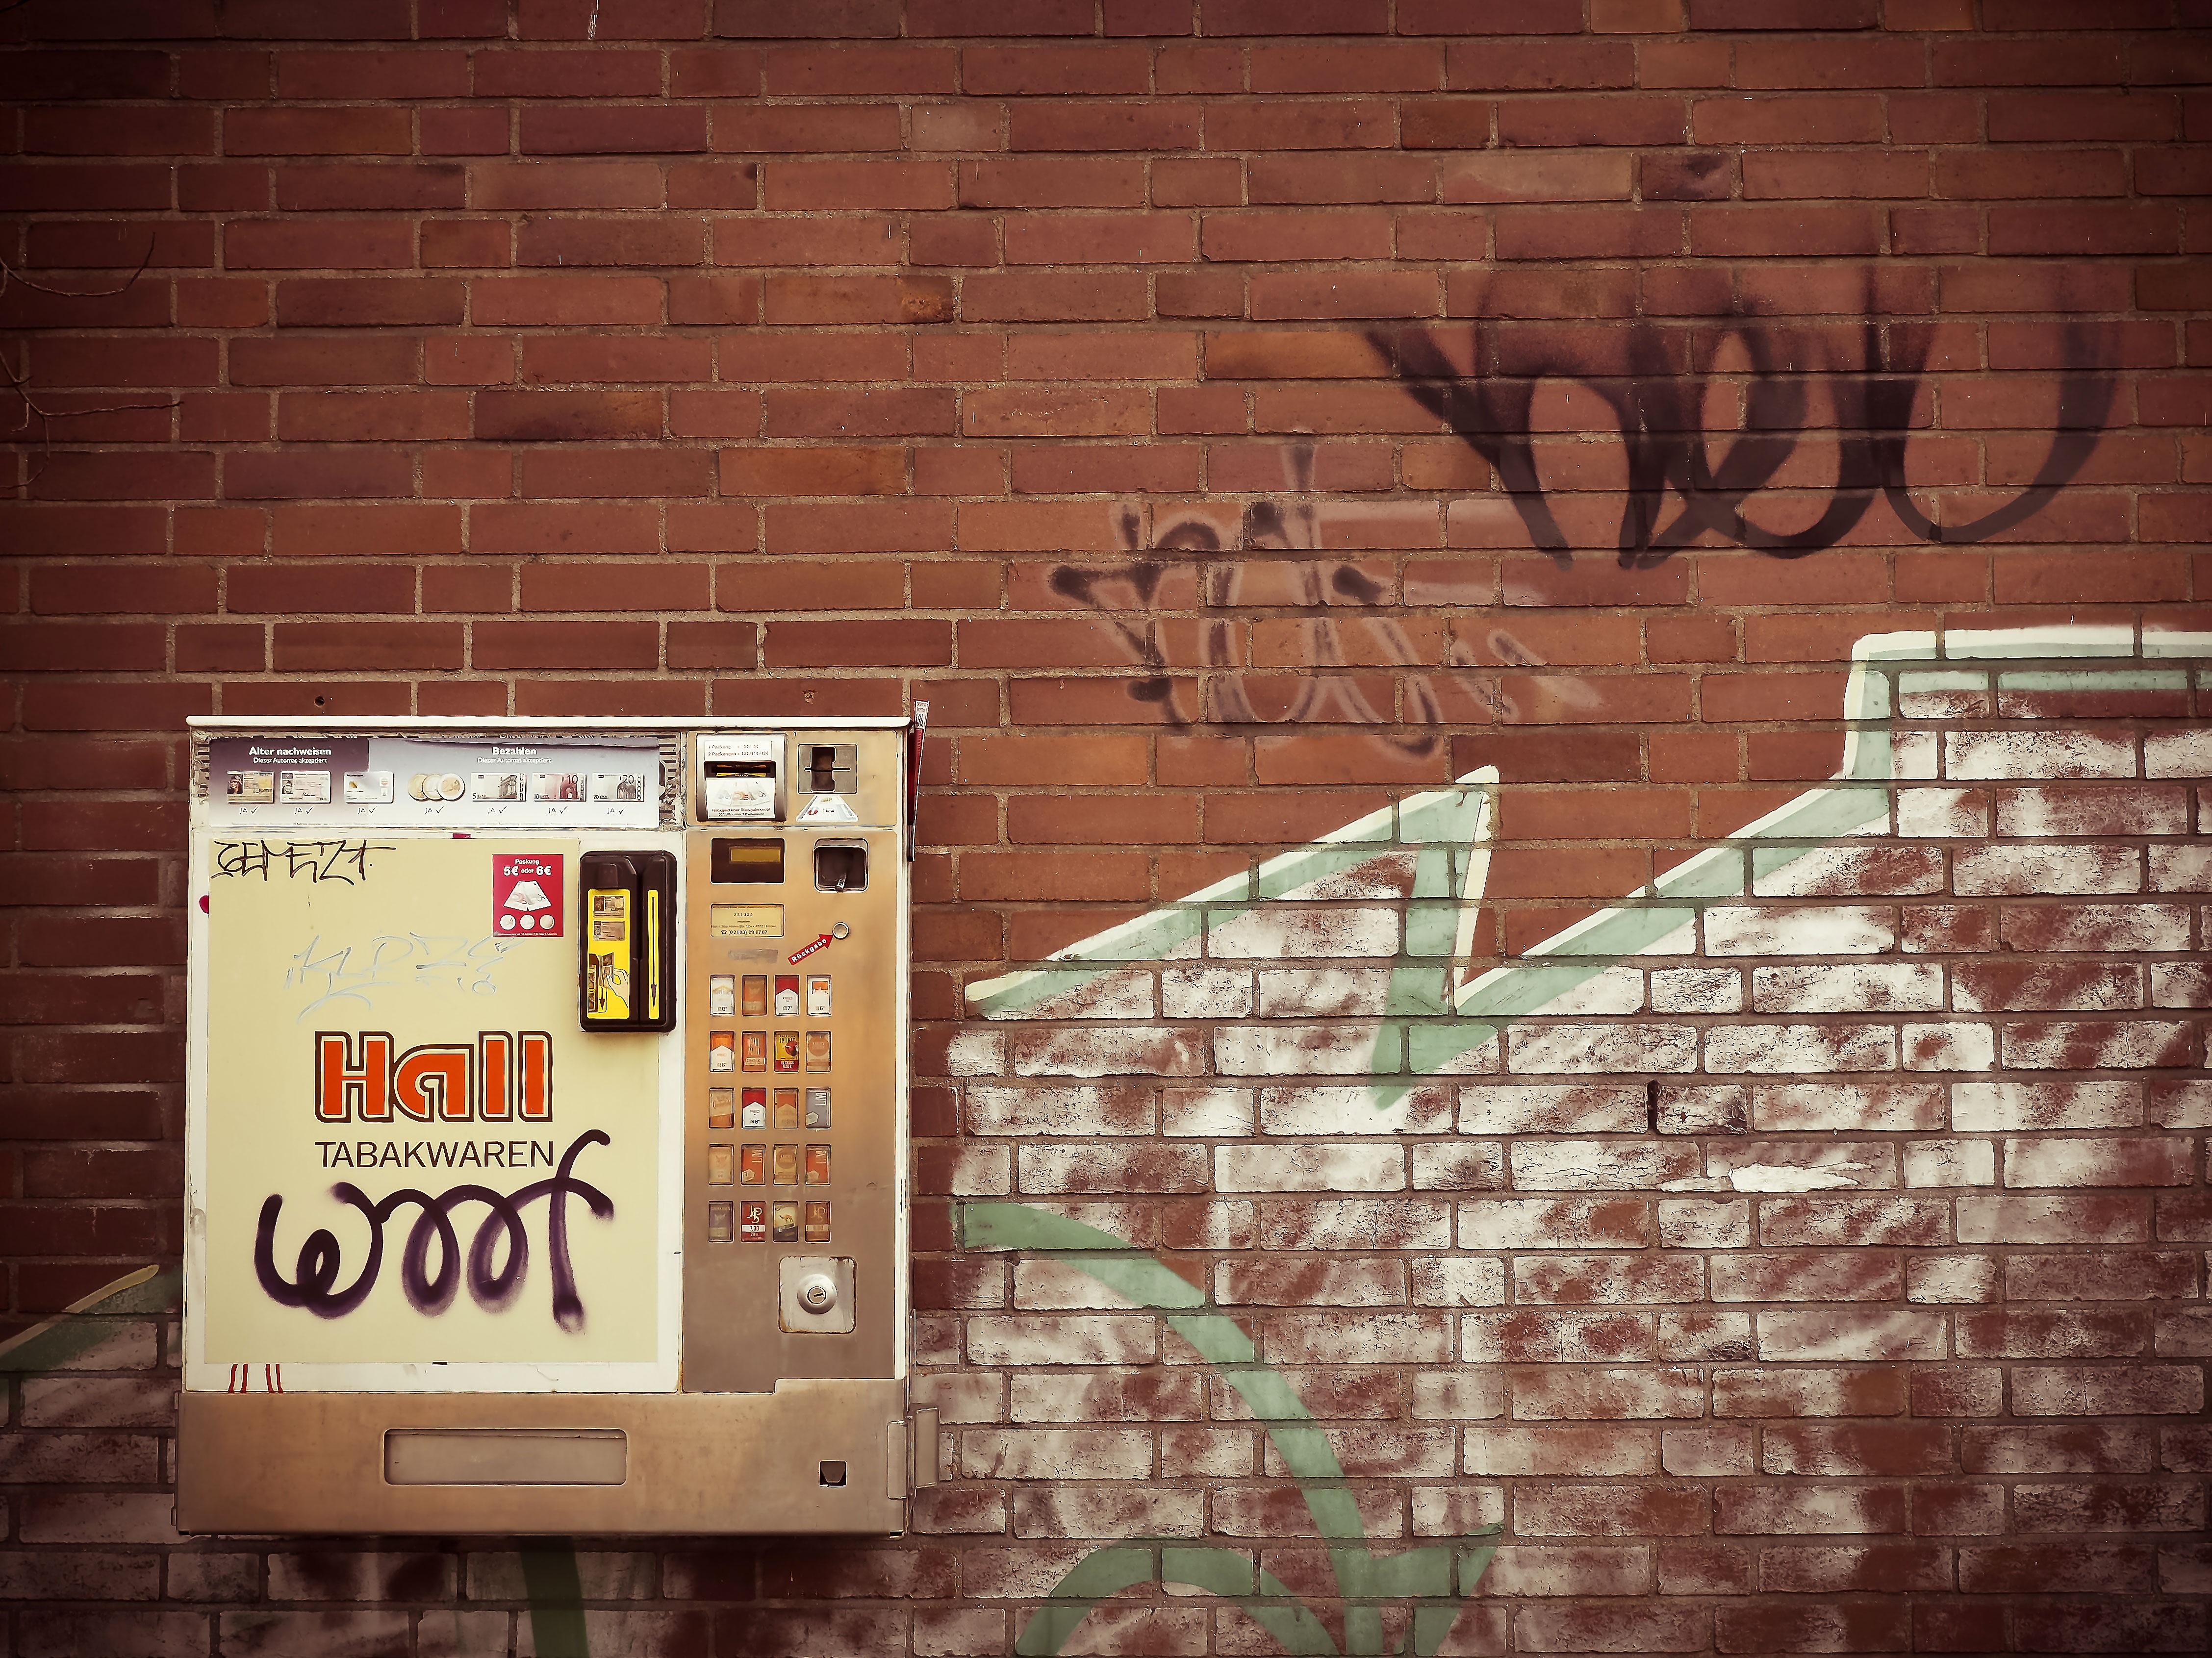 Graffiti art on wood - Wood Vintage Old City Urban Wall Smoking Color Facade Brick Graffiti Art Design Cigarettes Automatic Cigarette